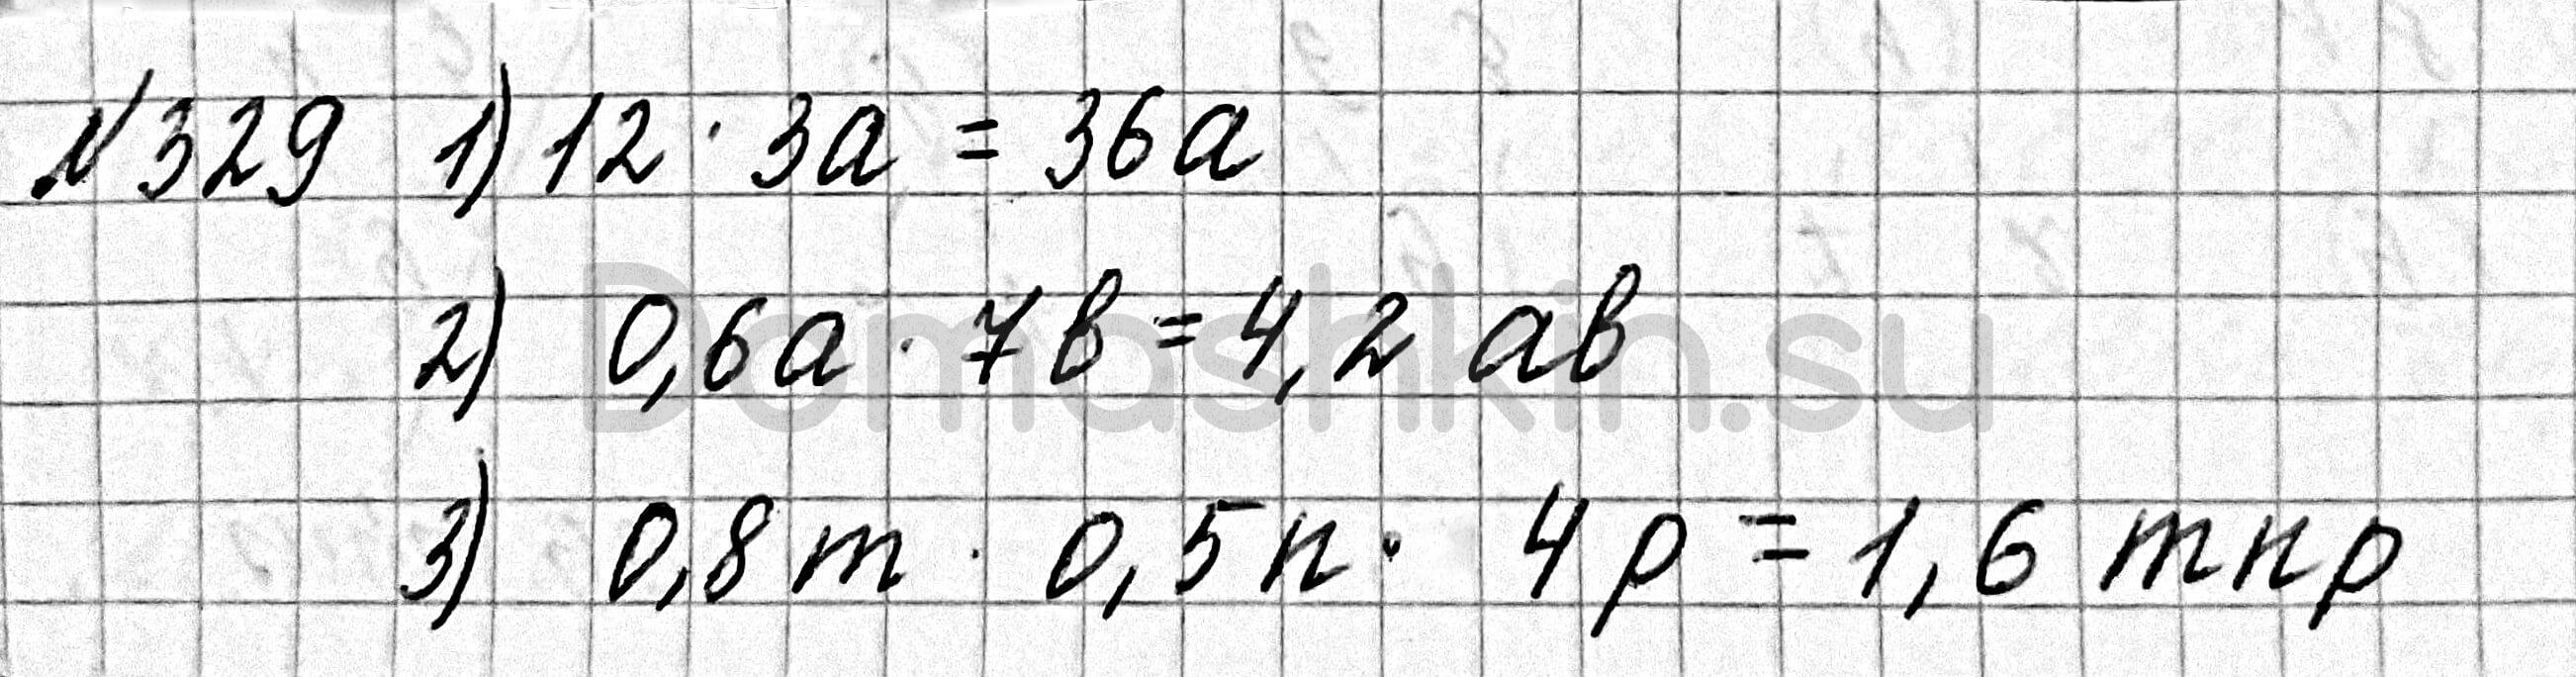 Математика 6 класс учебник Мерзляк номер 329 решение